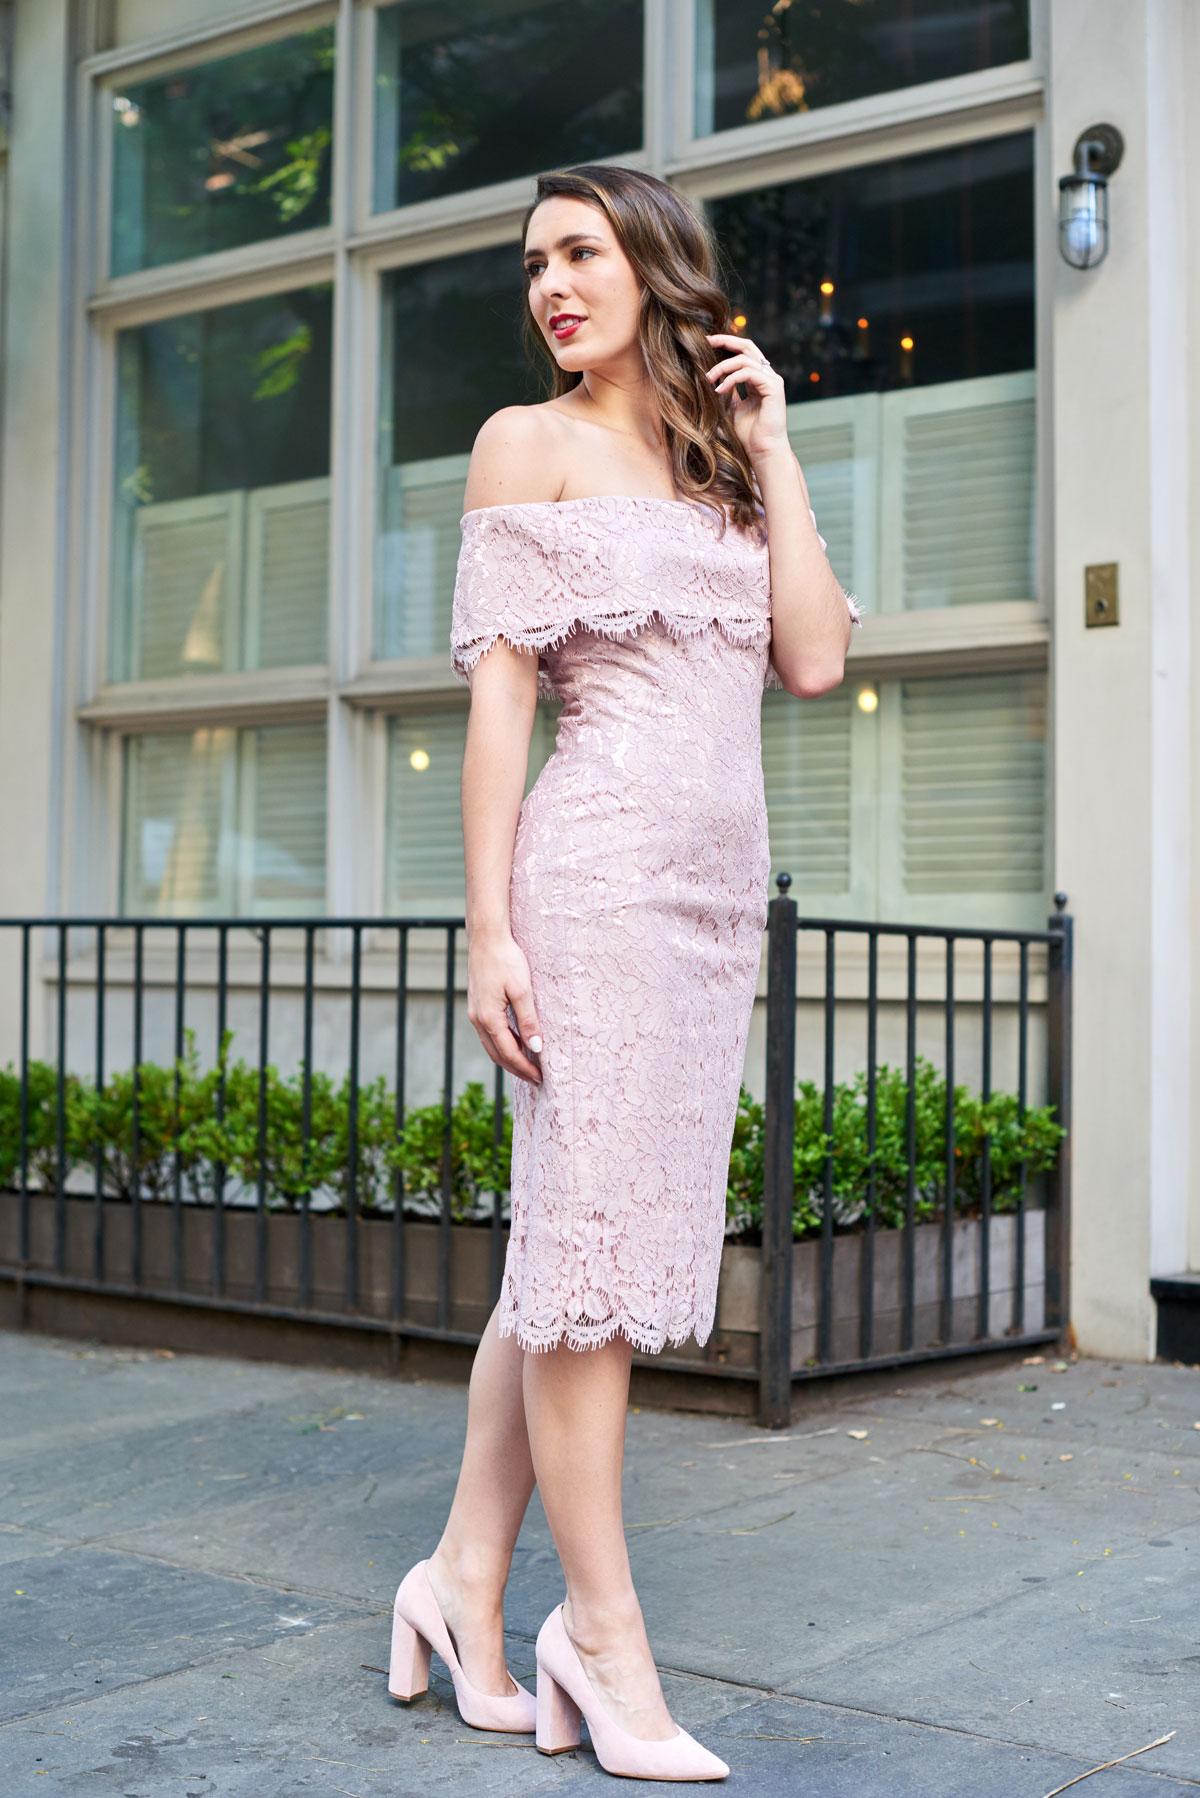 Samantha Metell of Bonjour Blue wearing a blush pink lace dress